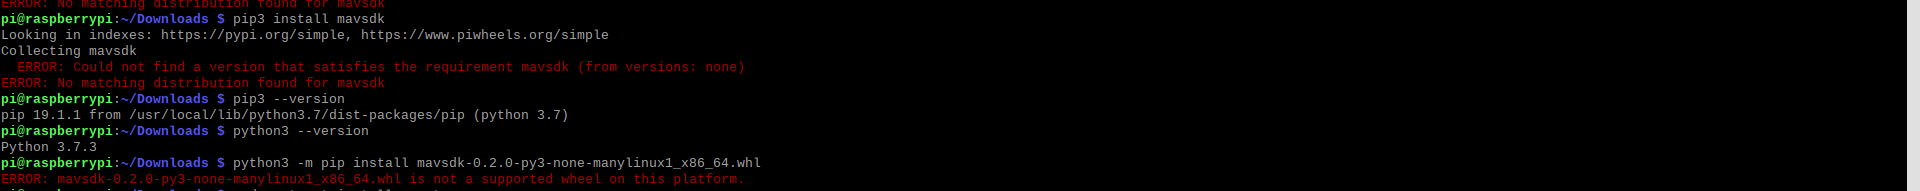 bozkurthan